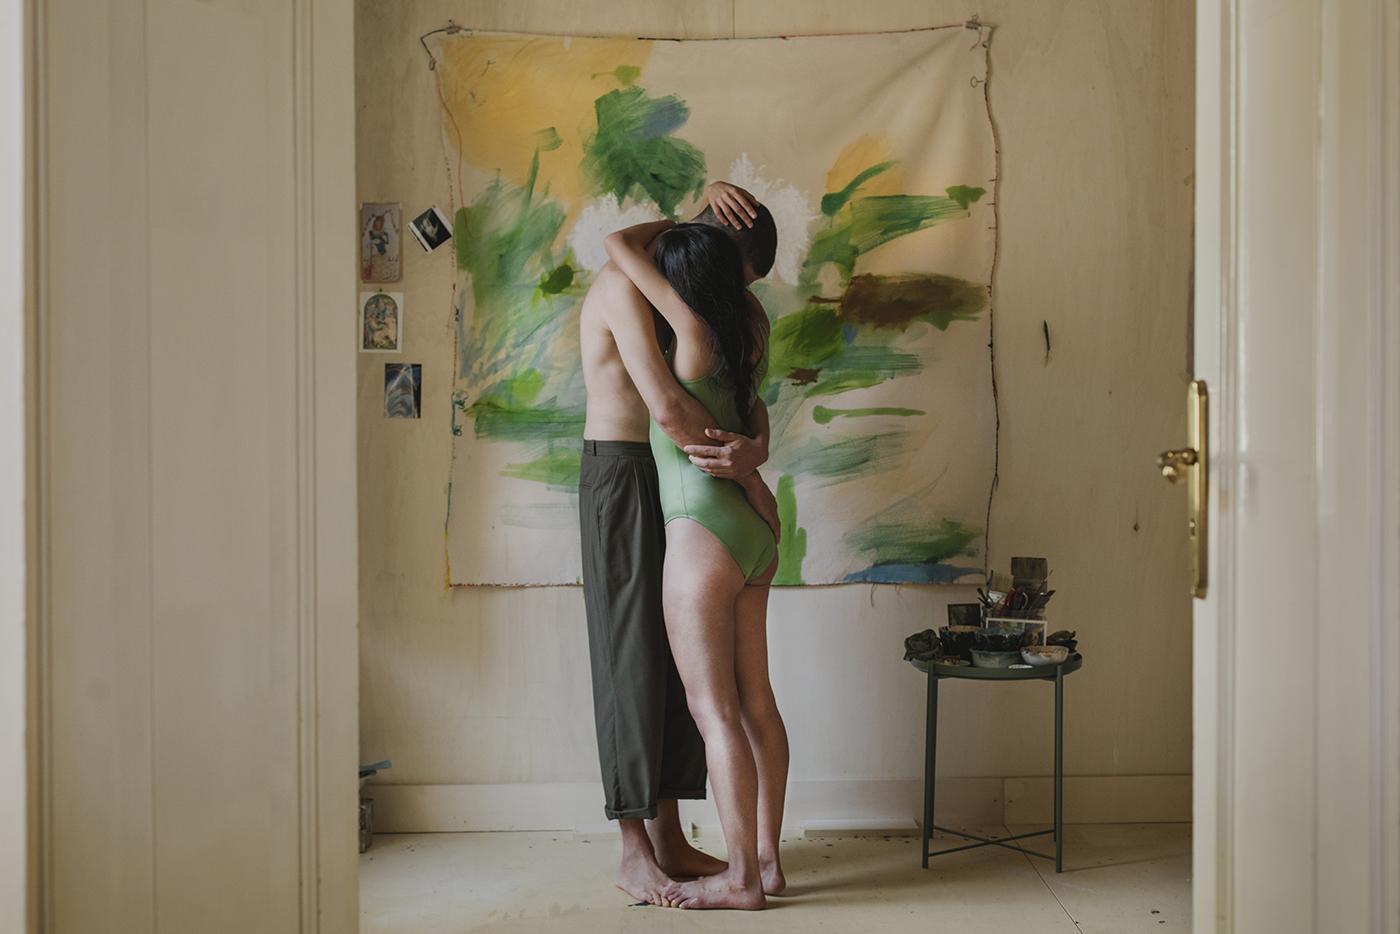 Chris Rocchegiani's studio